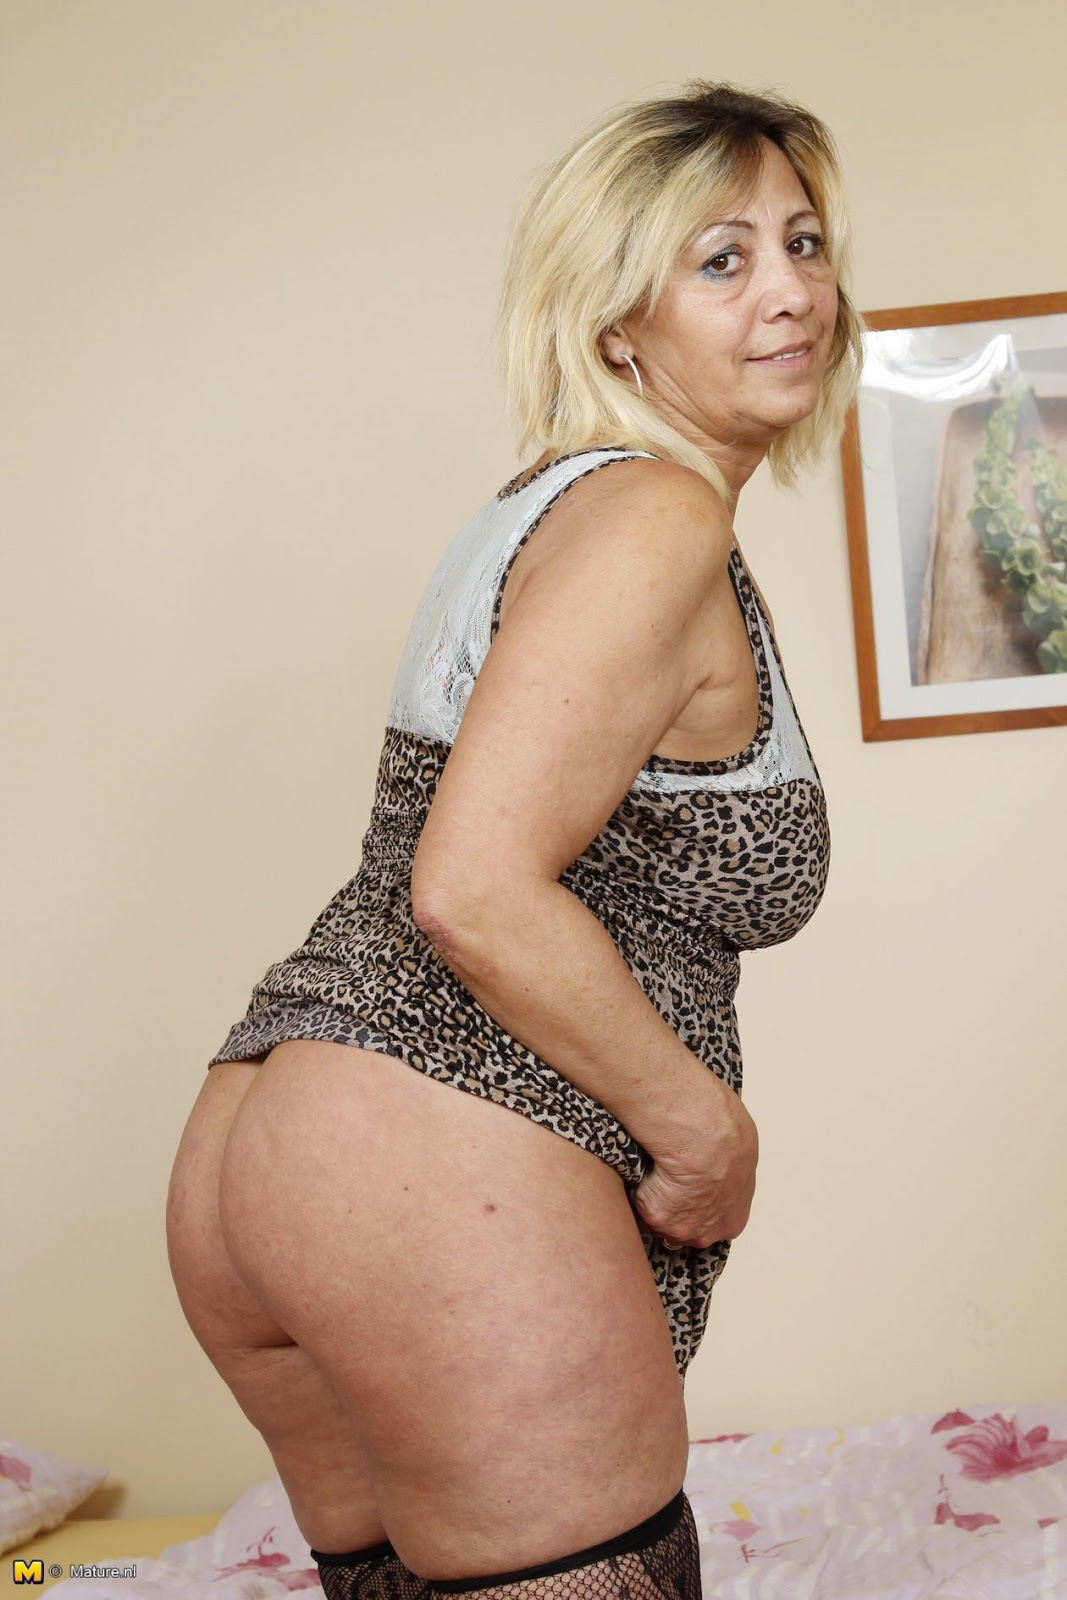 Midget woman video